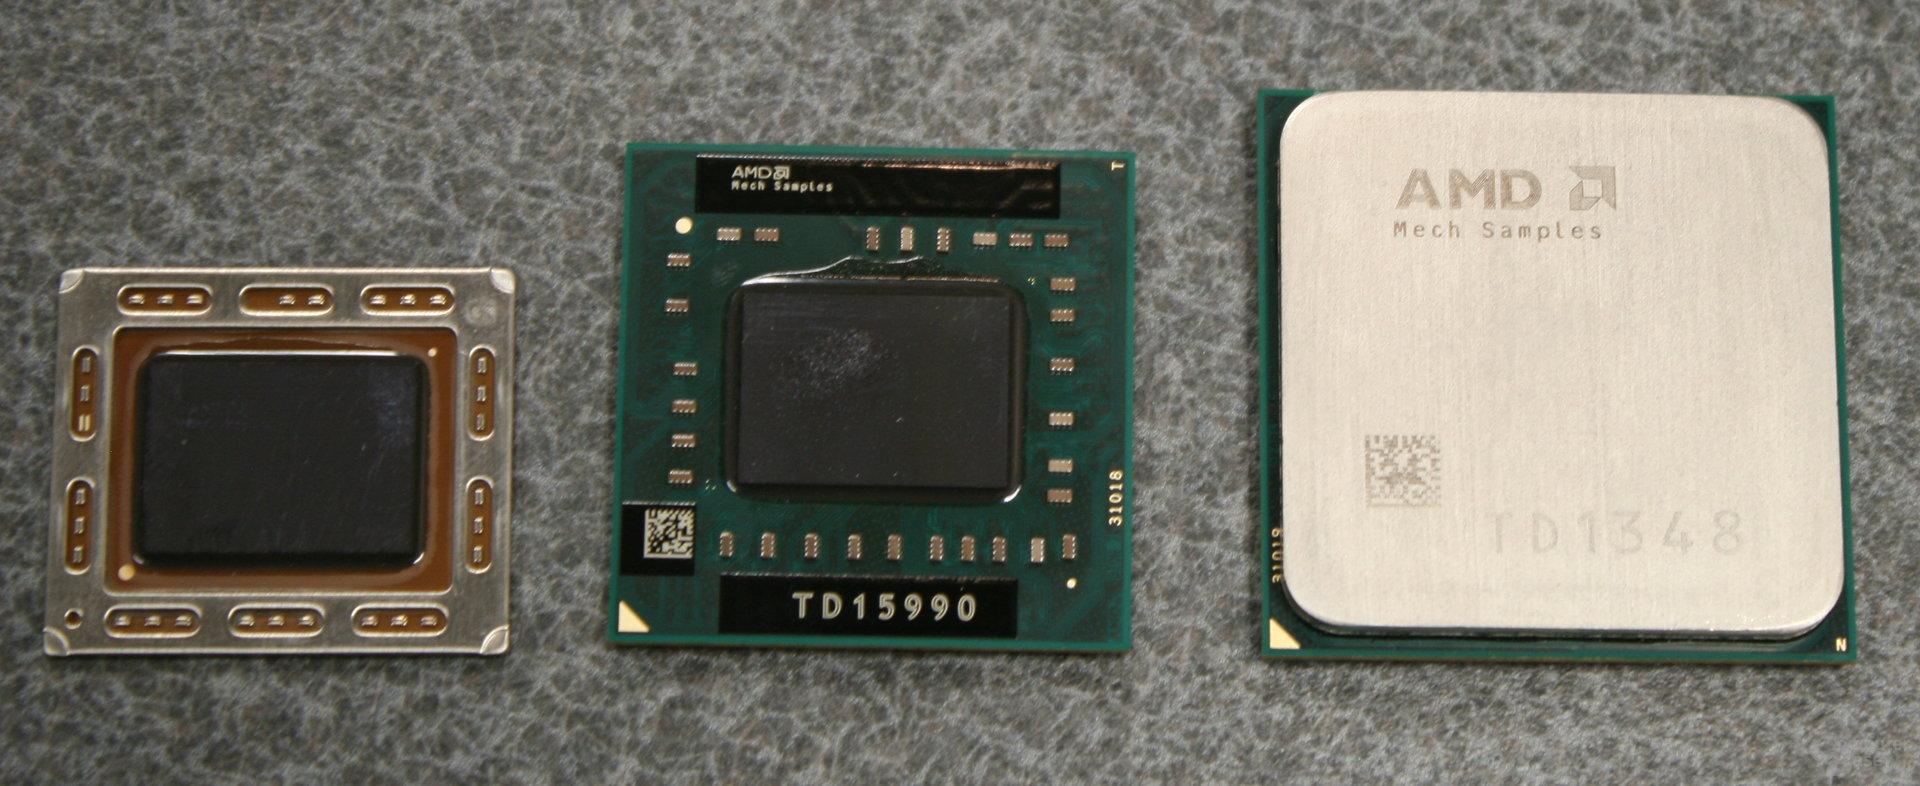 AMDs Trinity